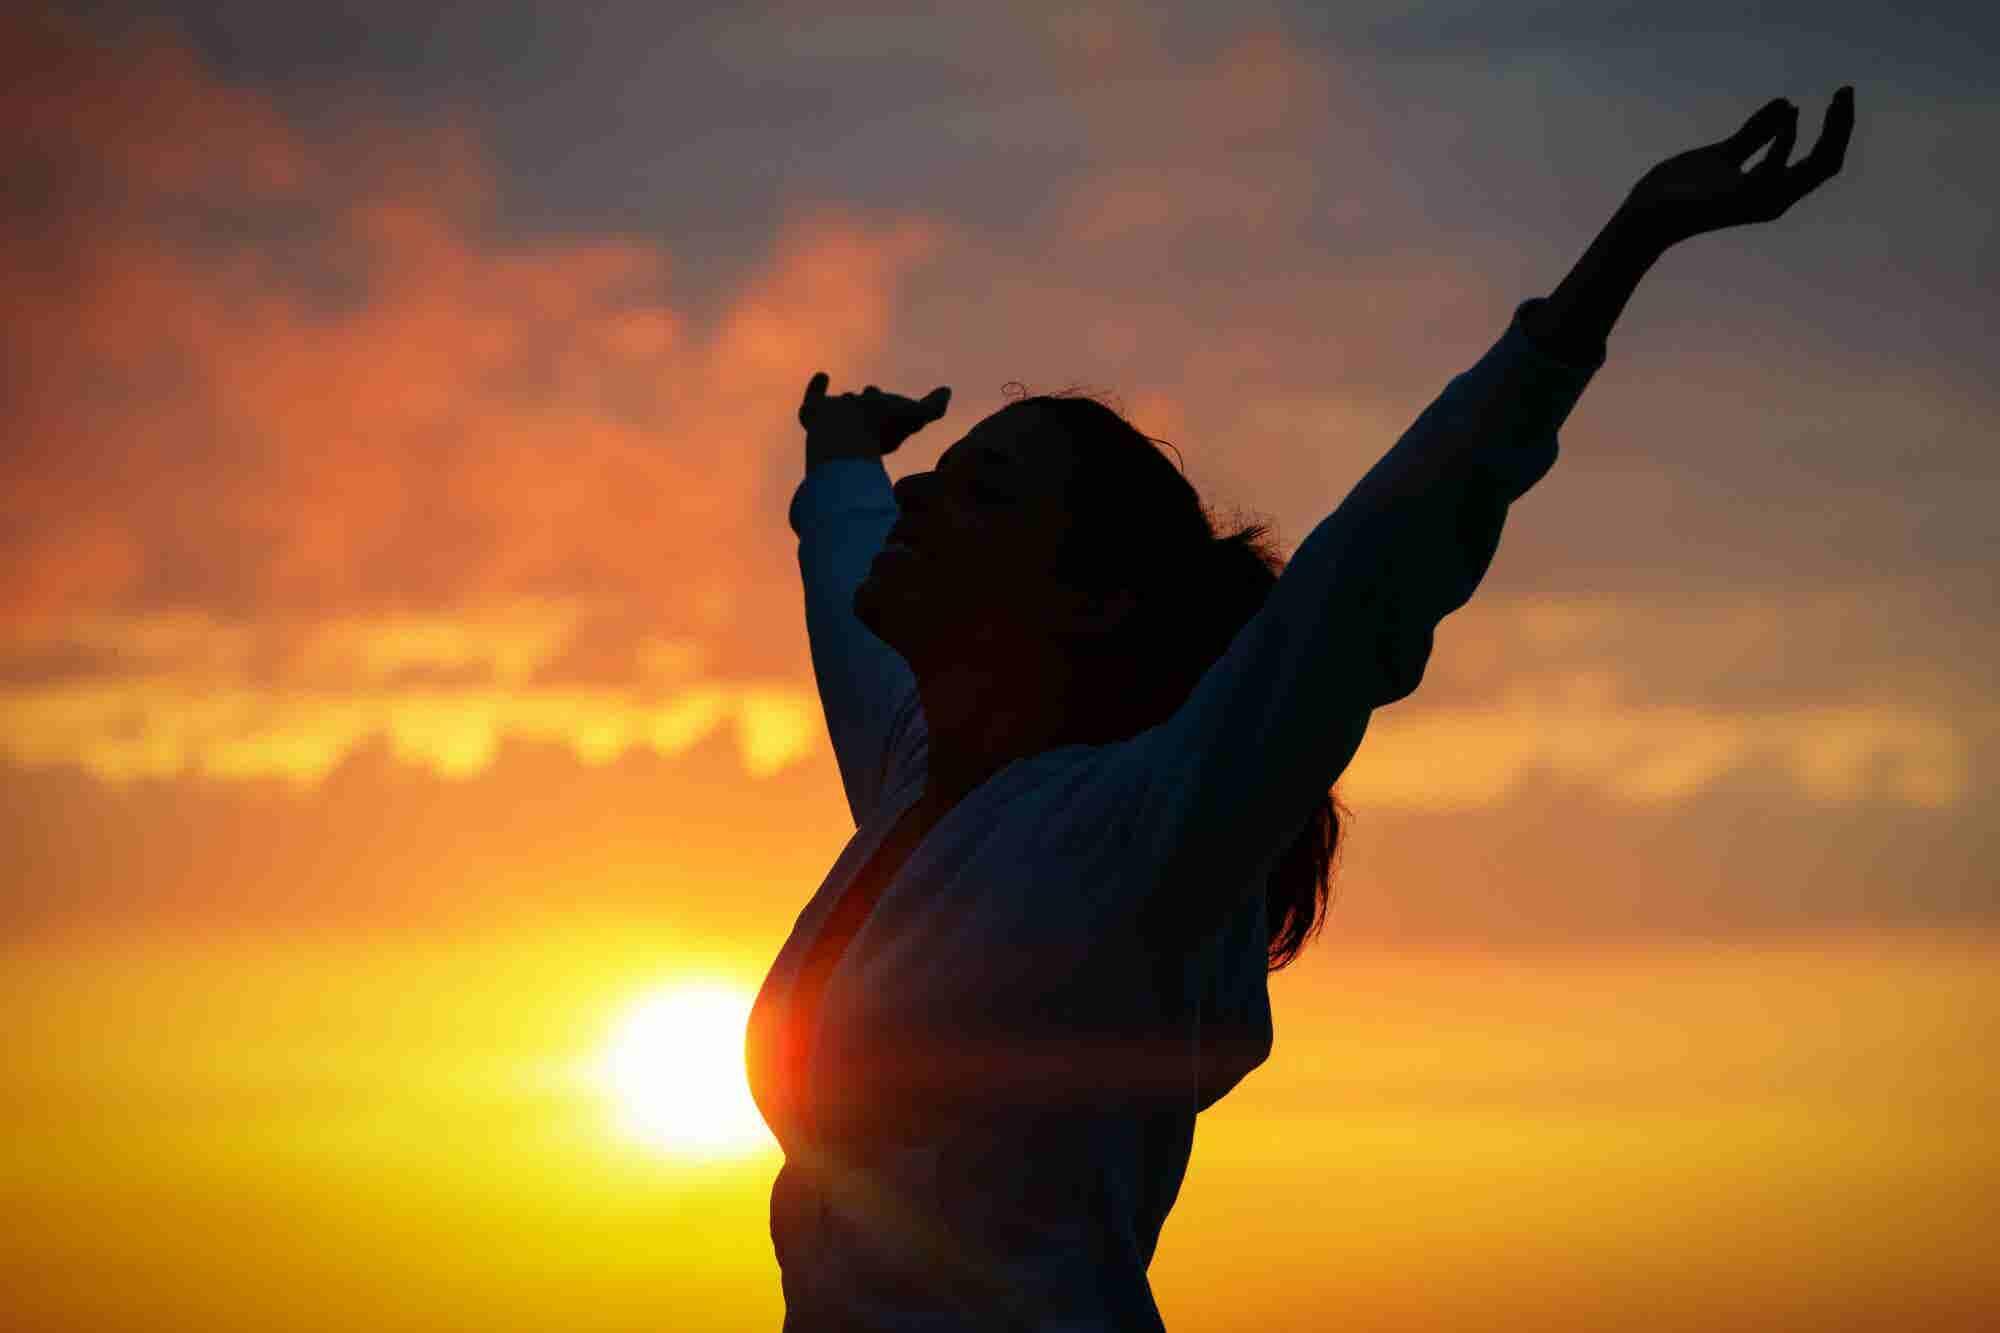 ¿Tuviste un mal día? Estos 6 trucos te ayudarán a mantenerte motivado